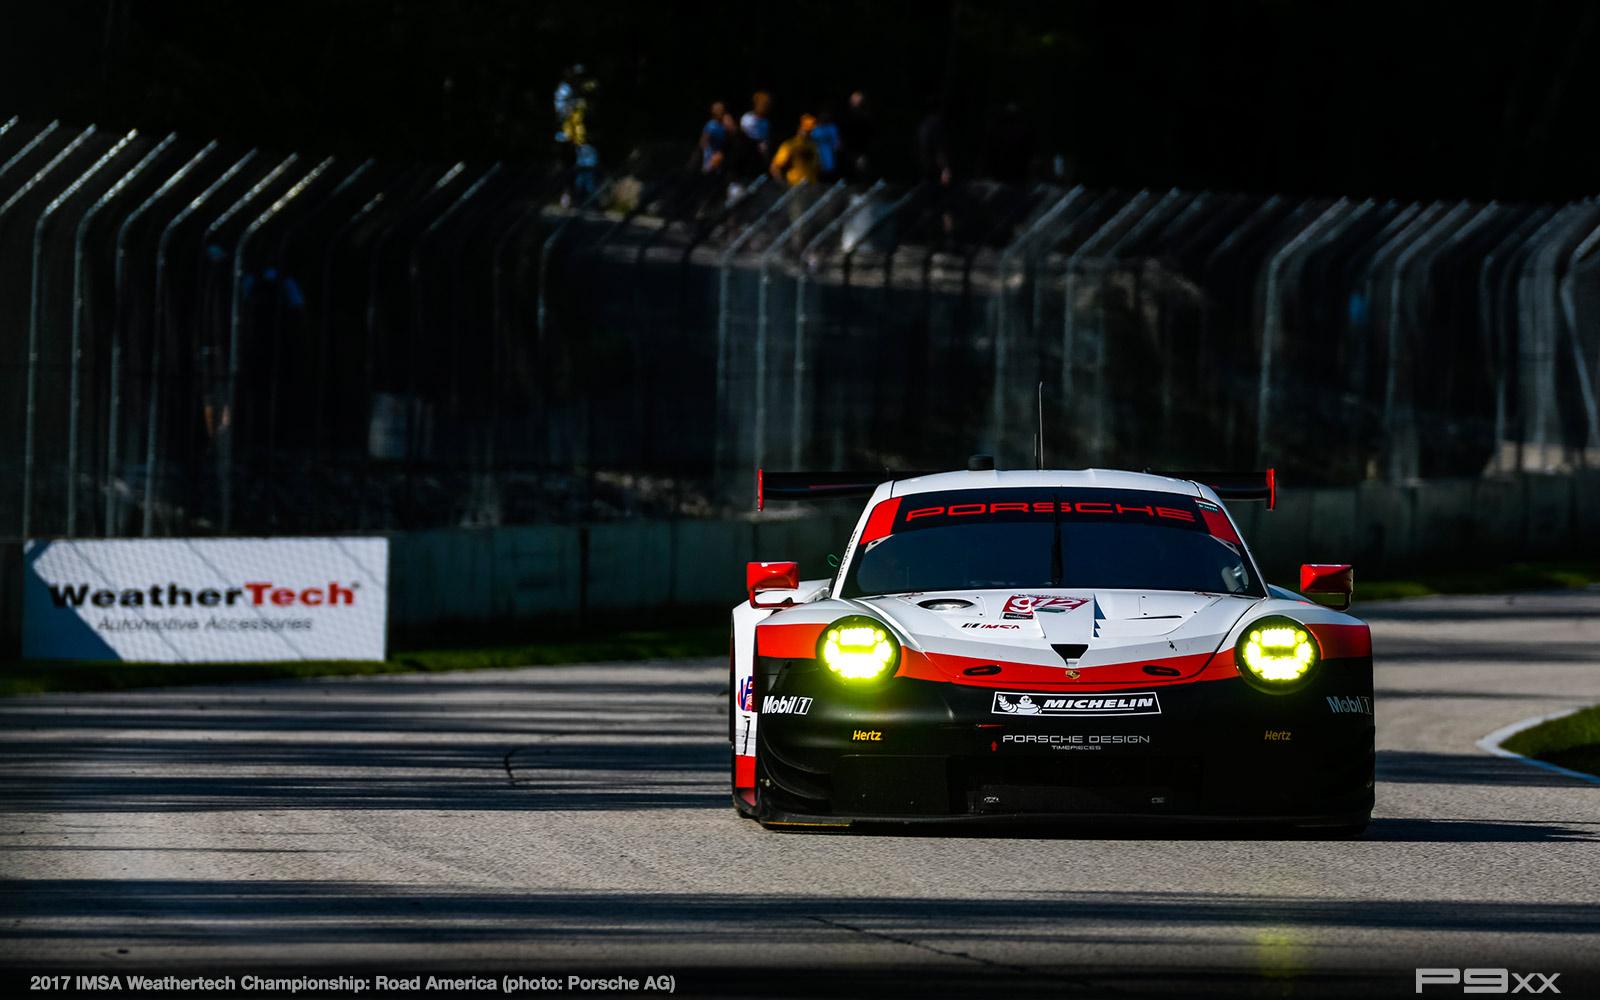 2017-IMSA-Weathertech-Road-America-Porsche-320